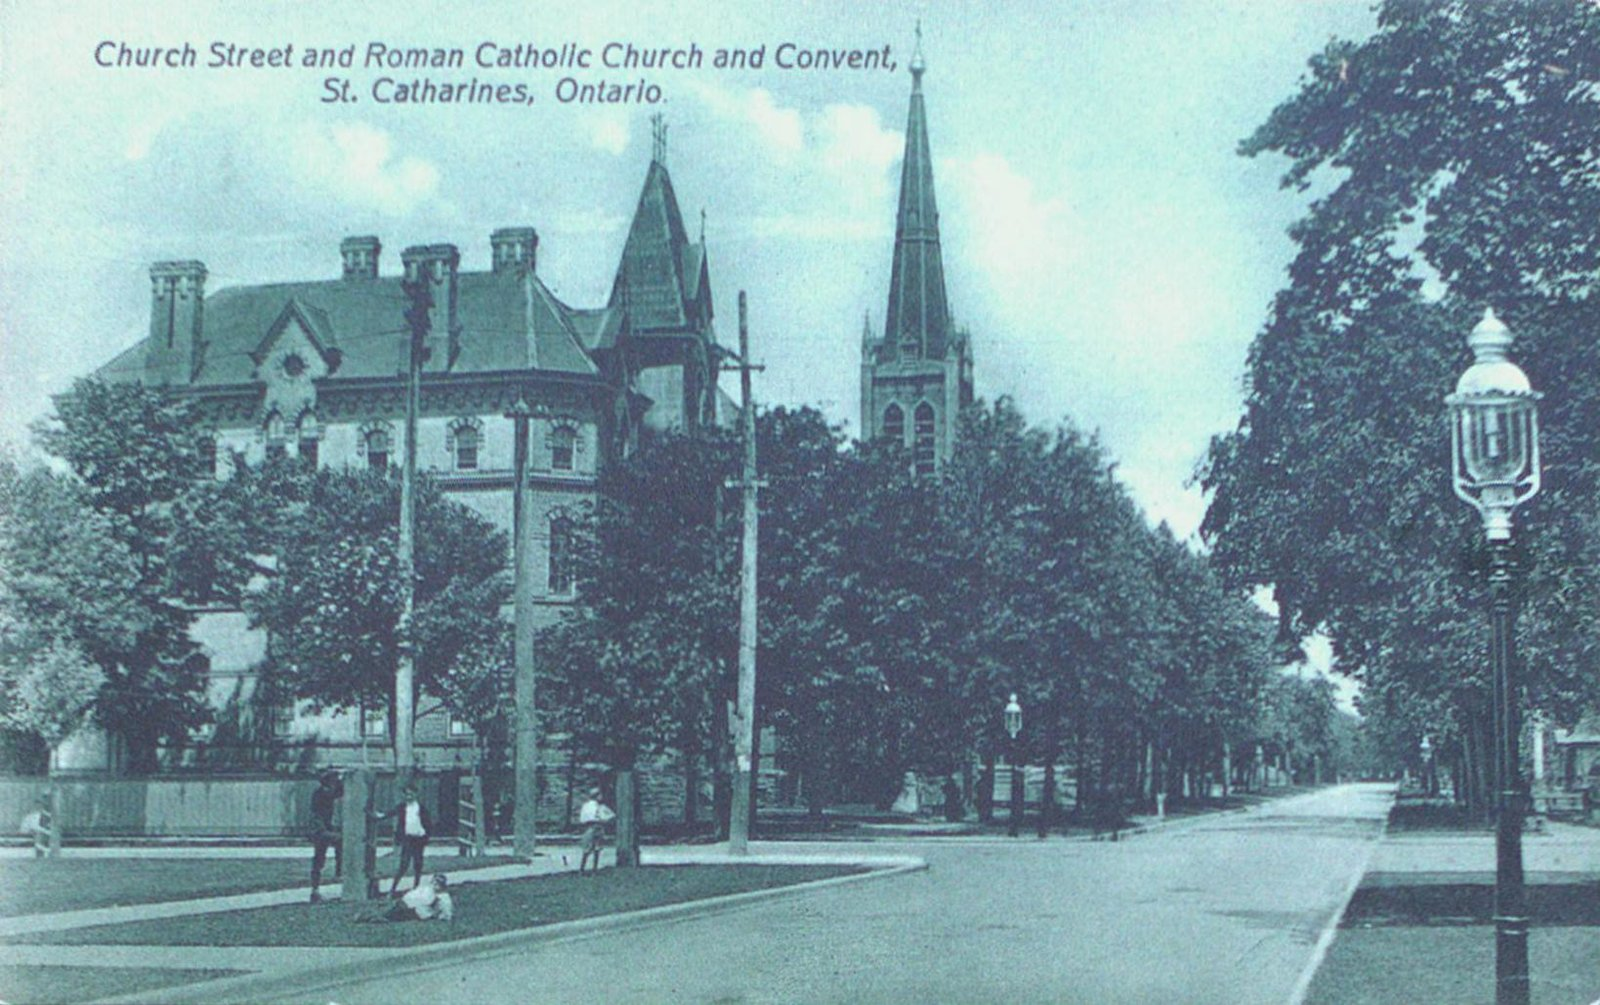 Church Street and Roman Catholic Church and Convent